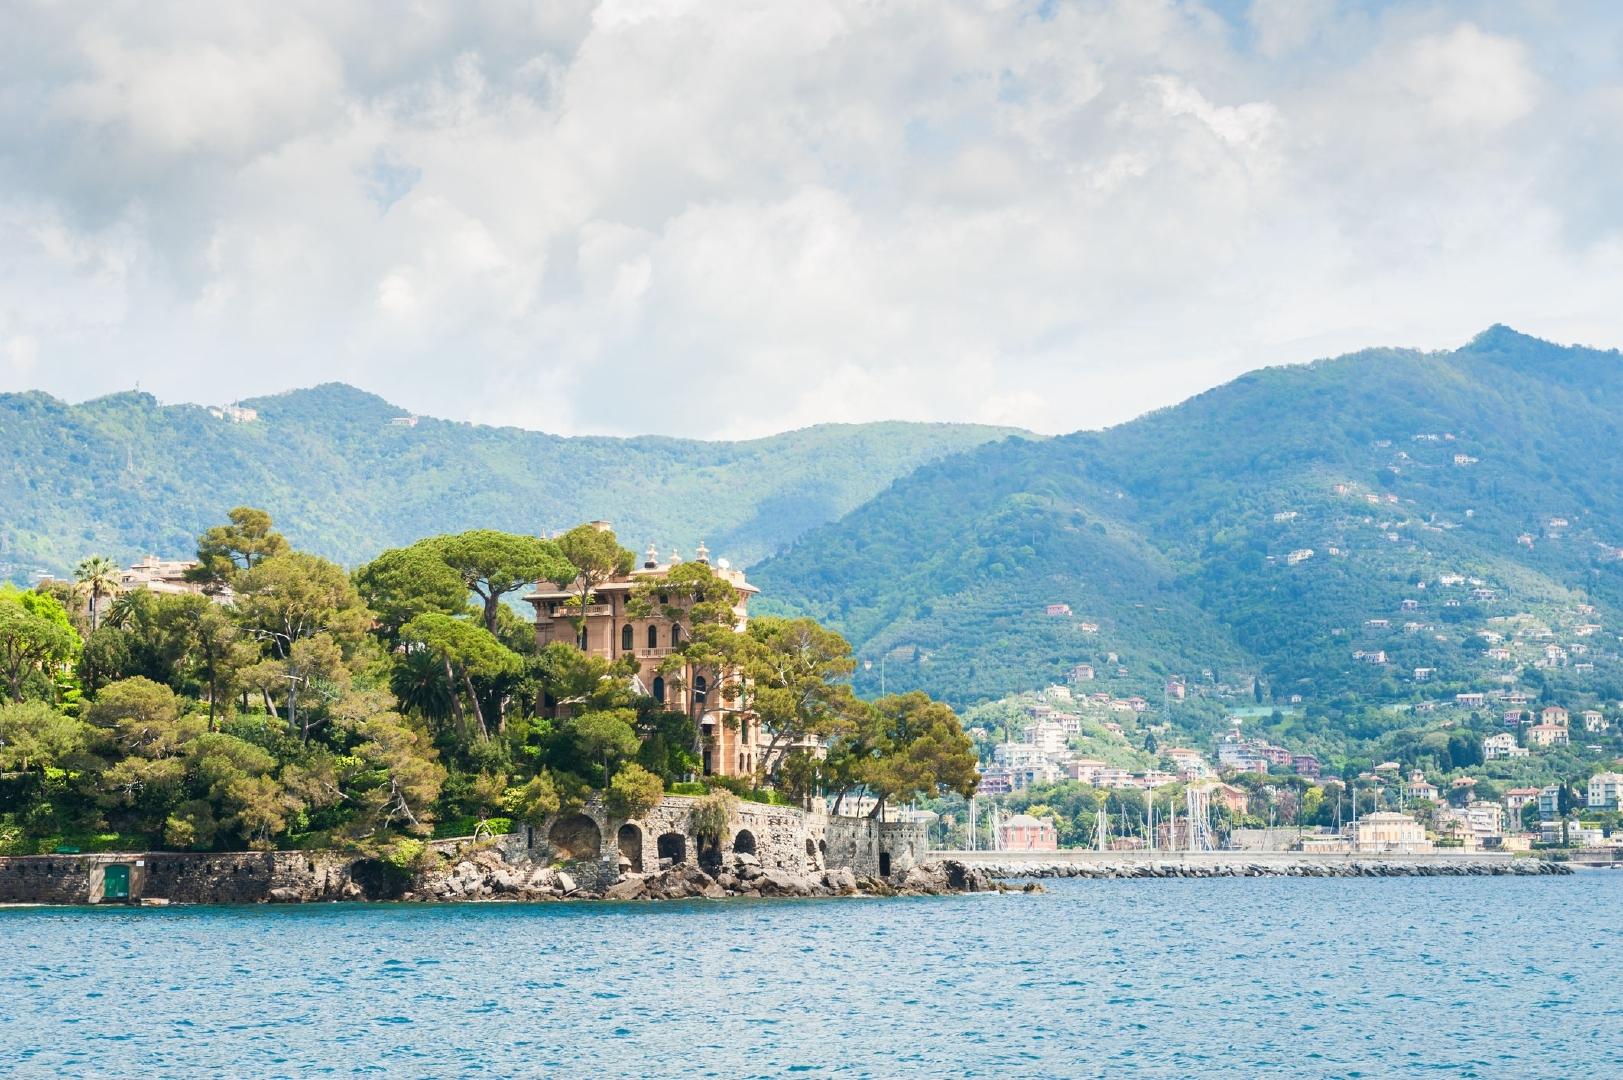 The beautiful view of the sea coast and mountains in Rapallo, Ligurian coast, Italy.